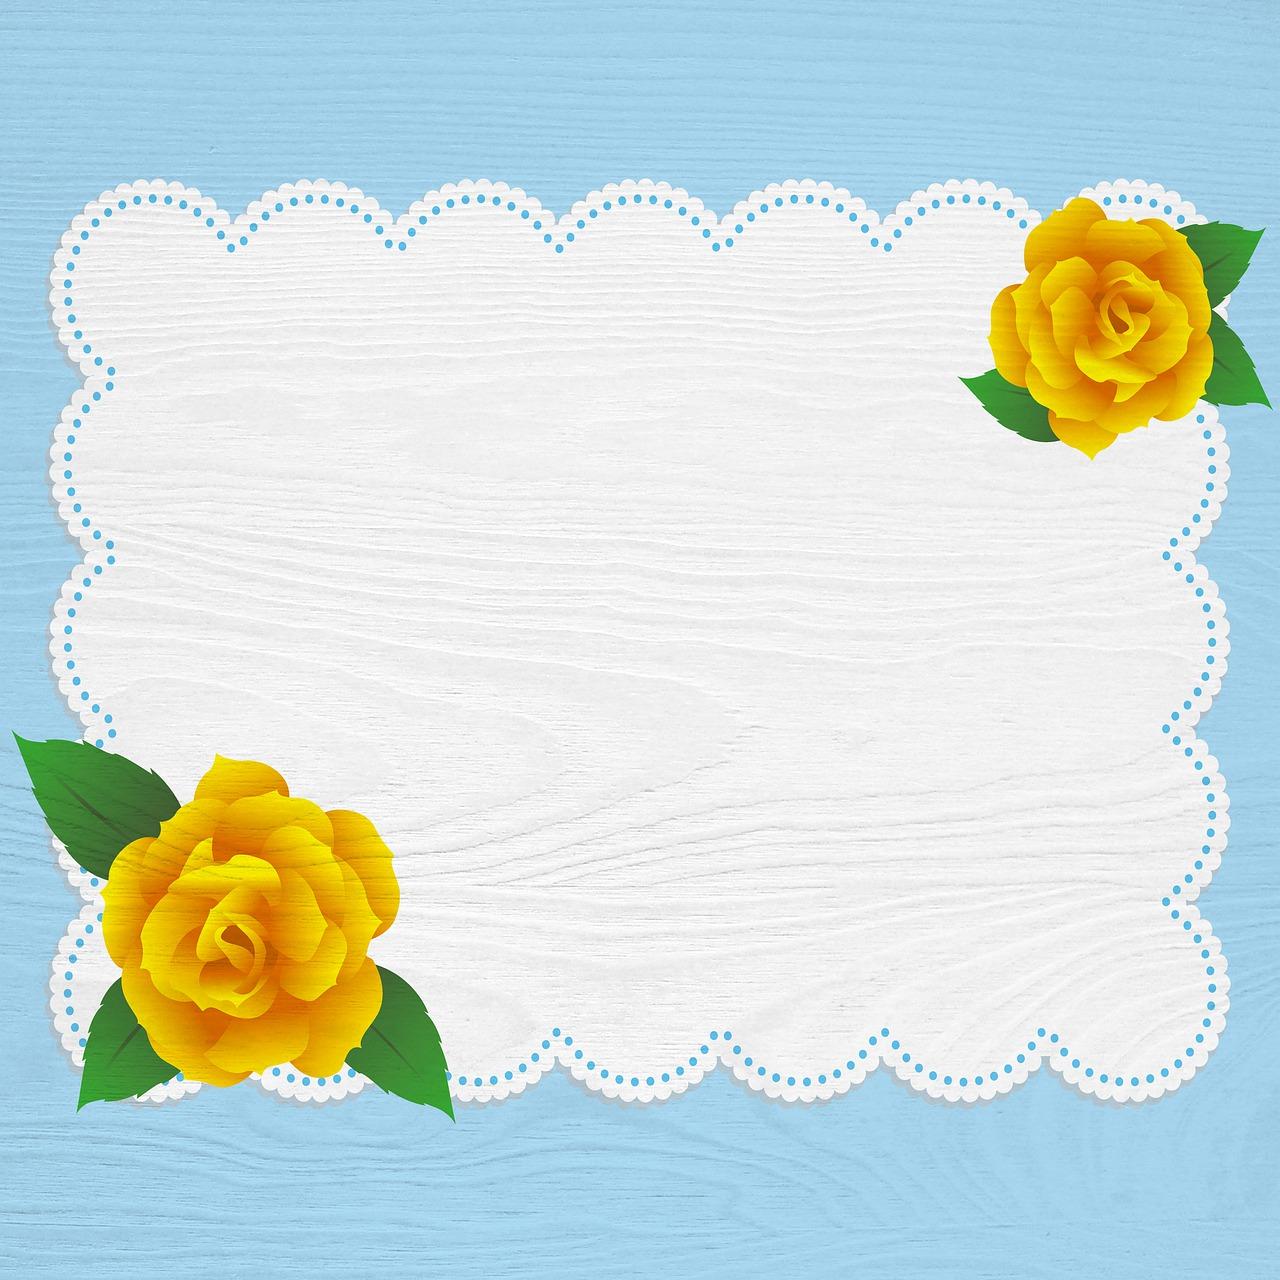 Wood Background Floral Leaves   Free image on Pixabay